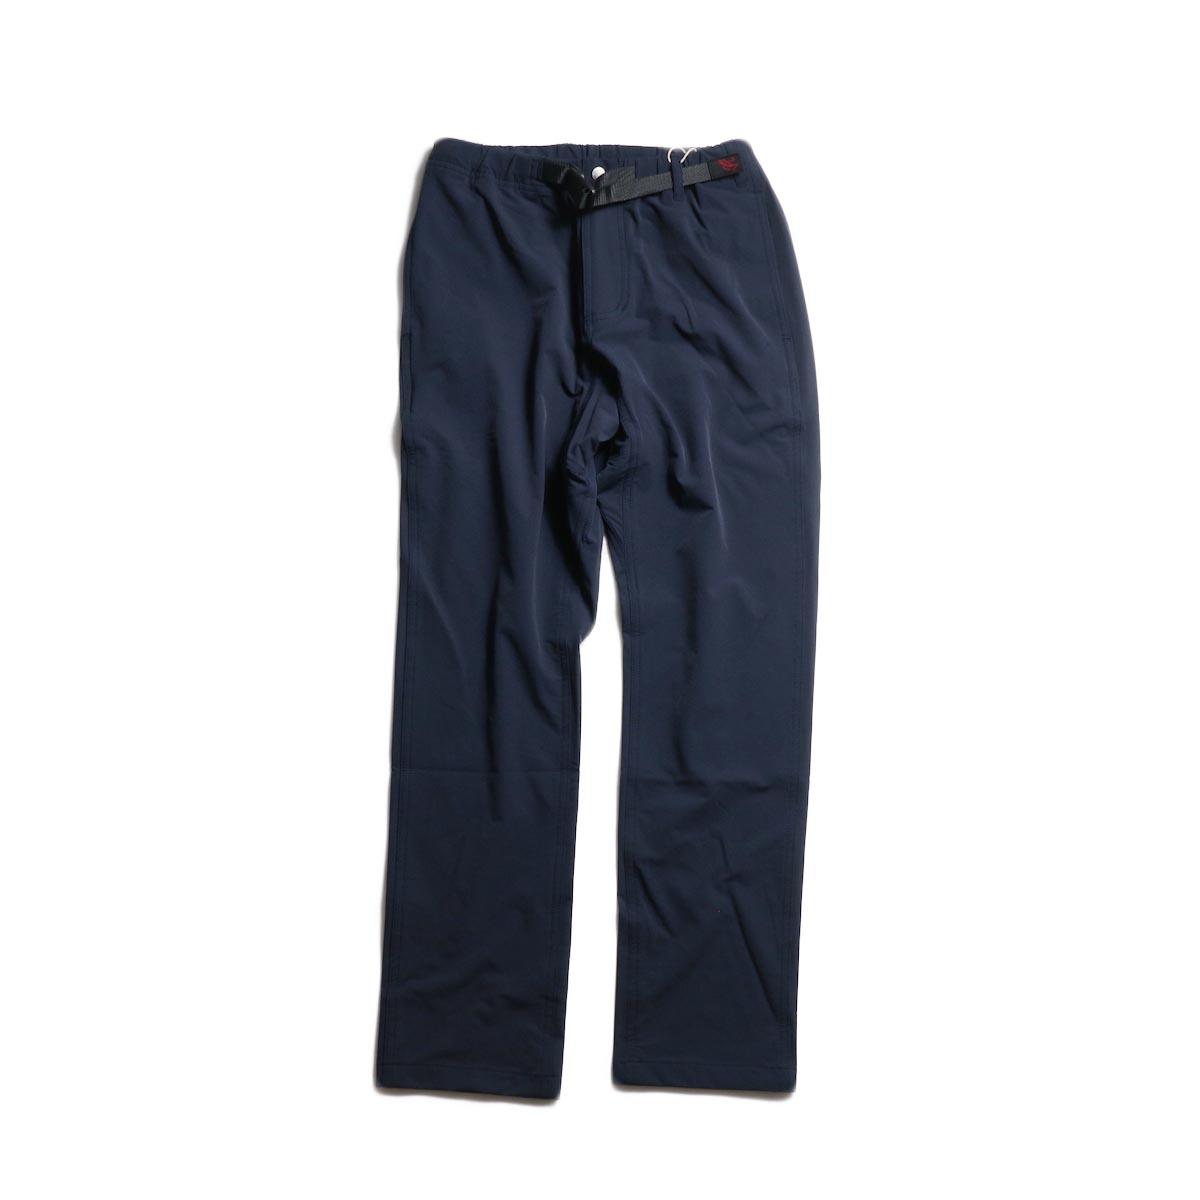 GRAMICCI / 4Way NN-Pant Just Cut -Double Navy